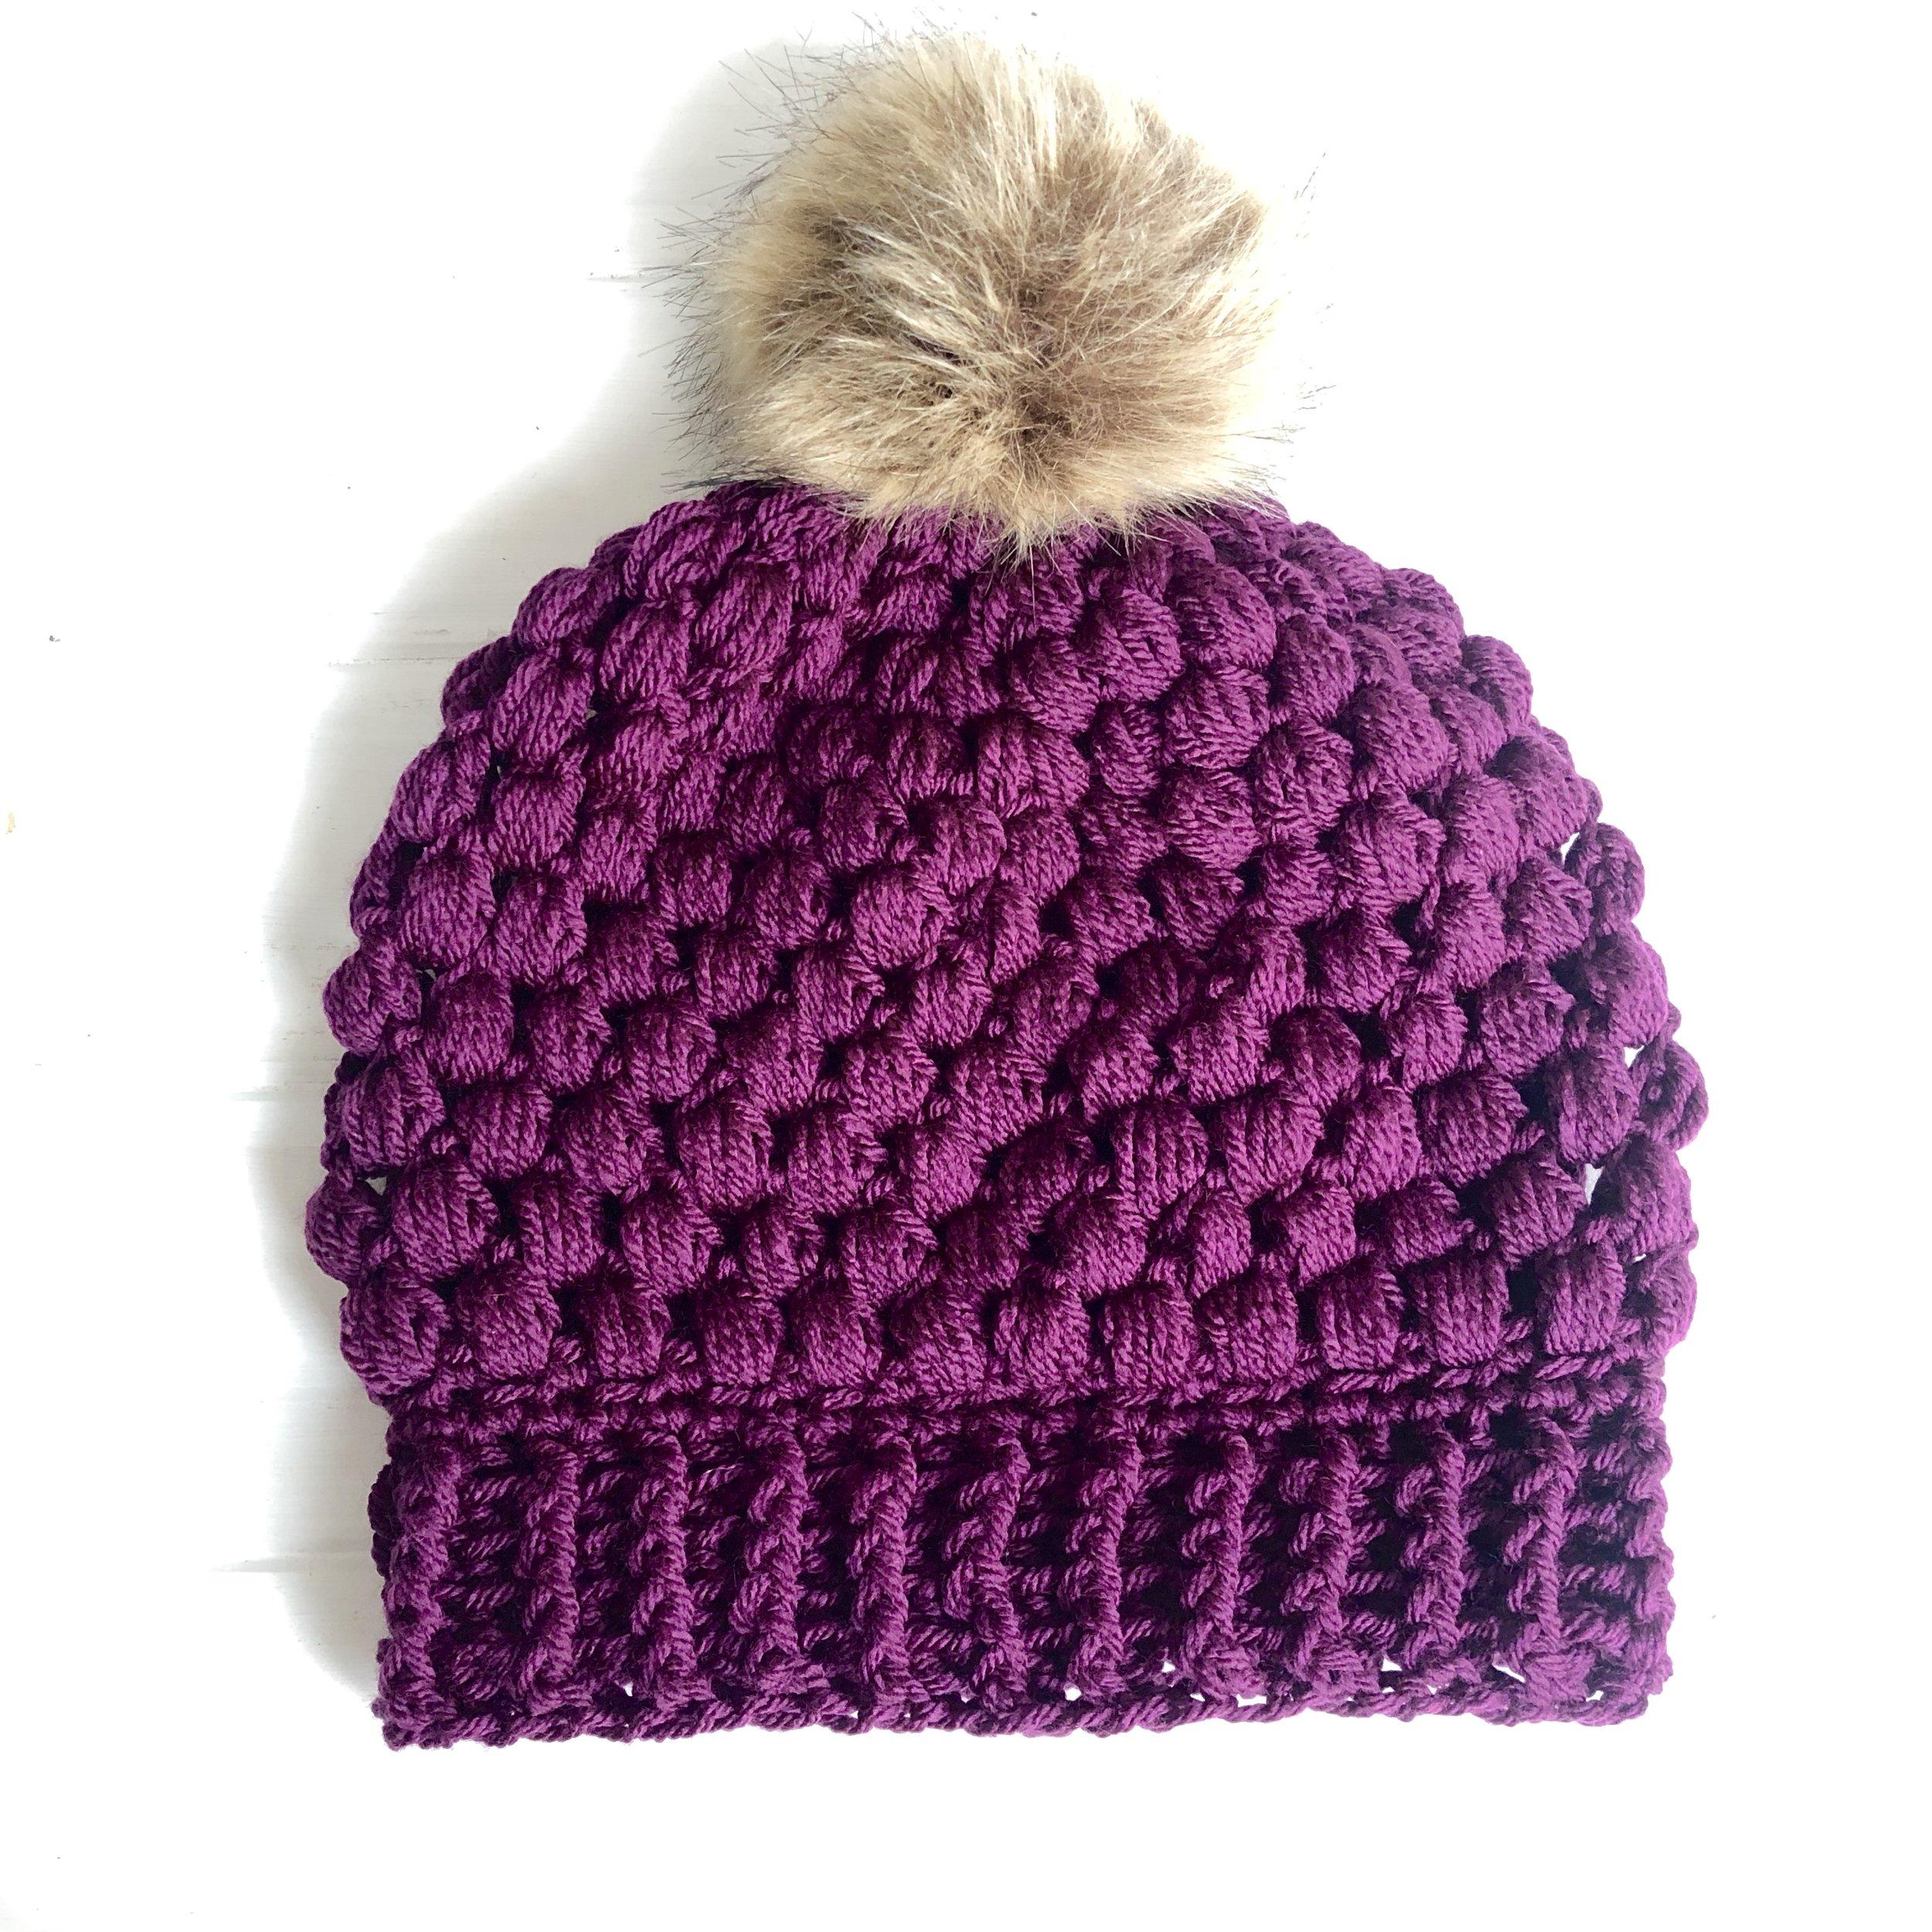 Sonoma Beanie Hat - Crochet Pattern - The Roving Nomad